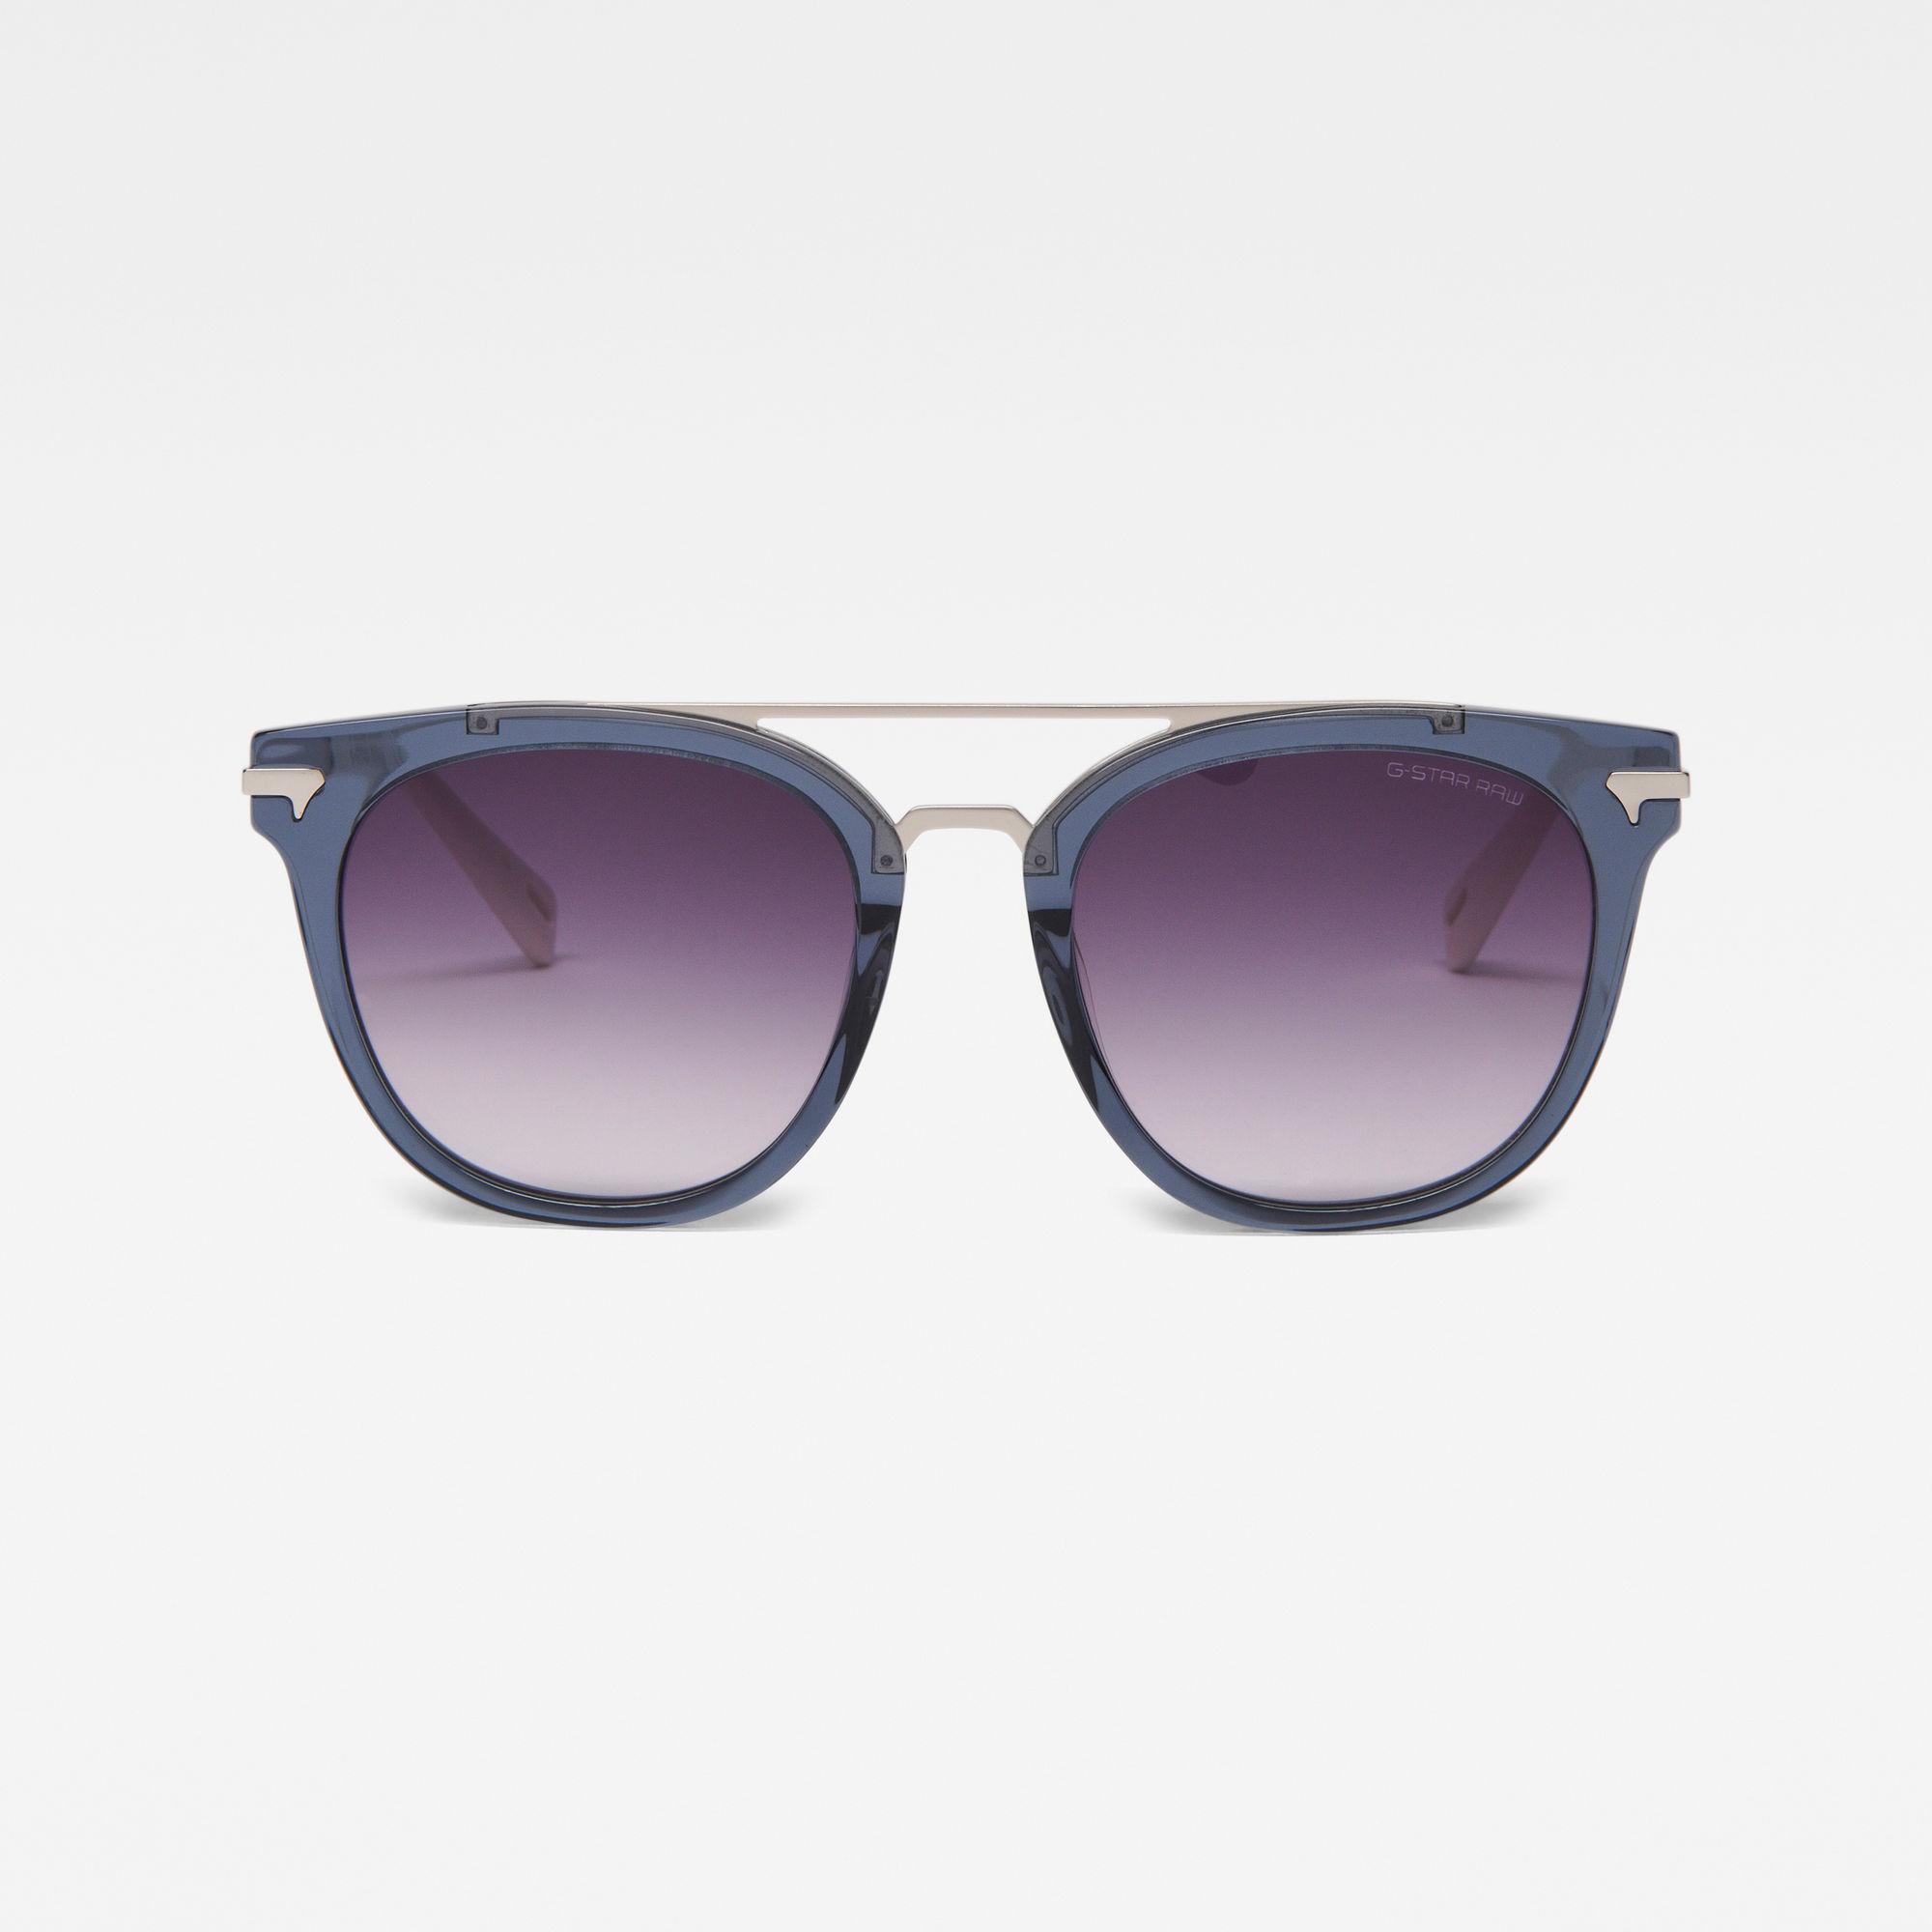 Combo Frior Sunglasses